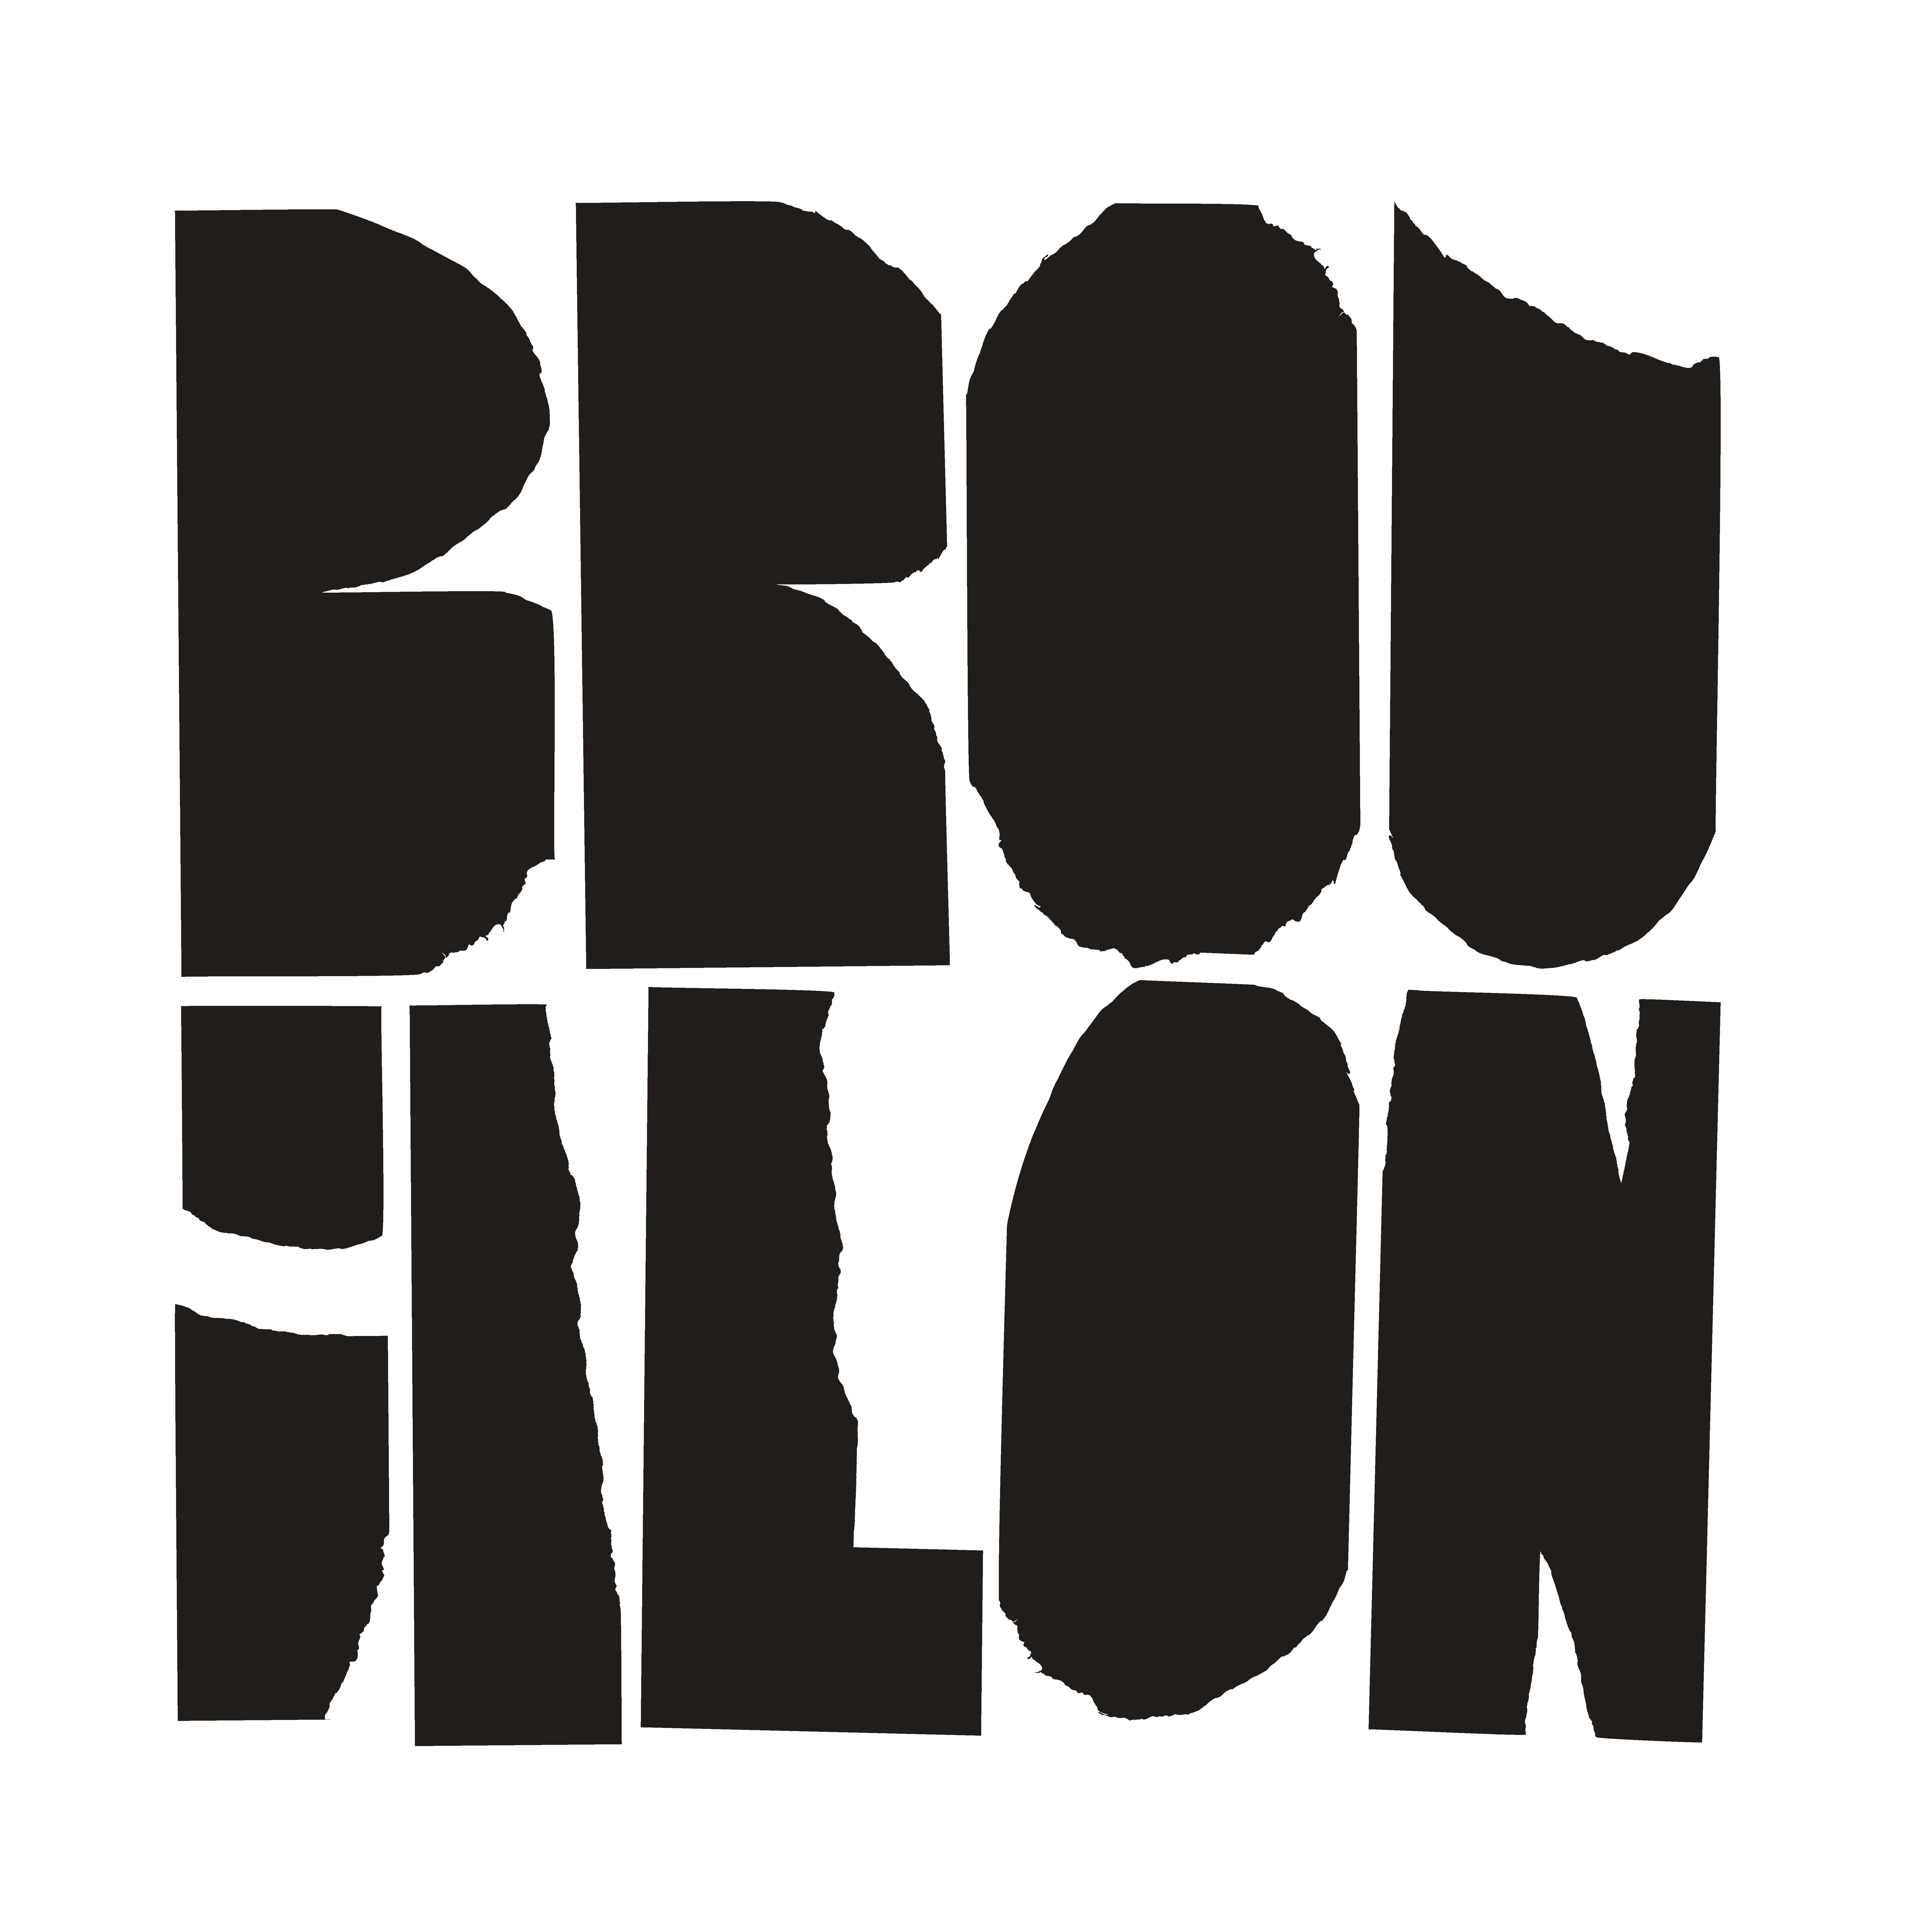 Brouillon 4